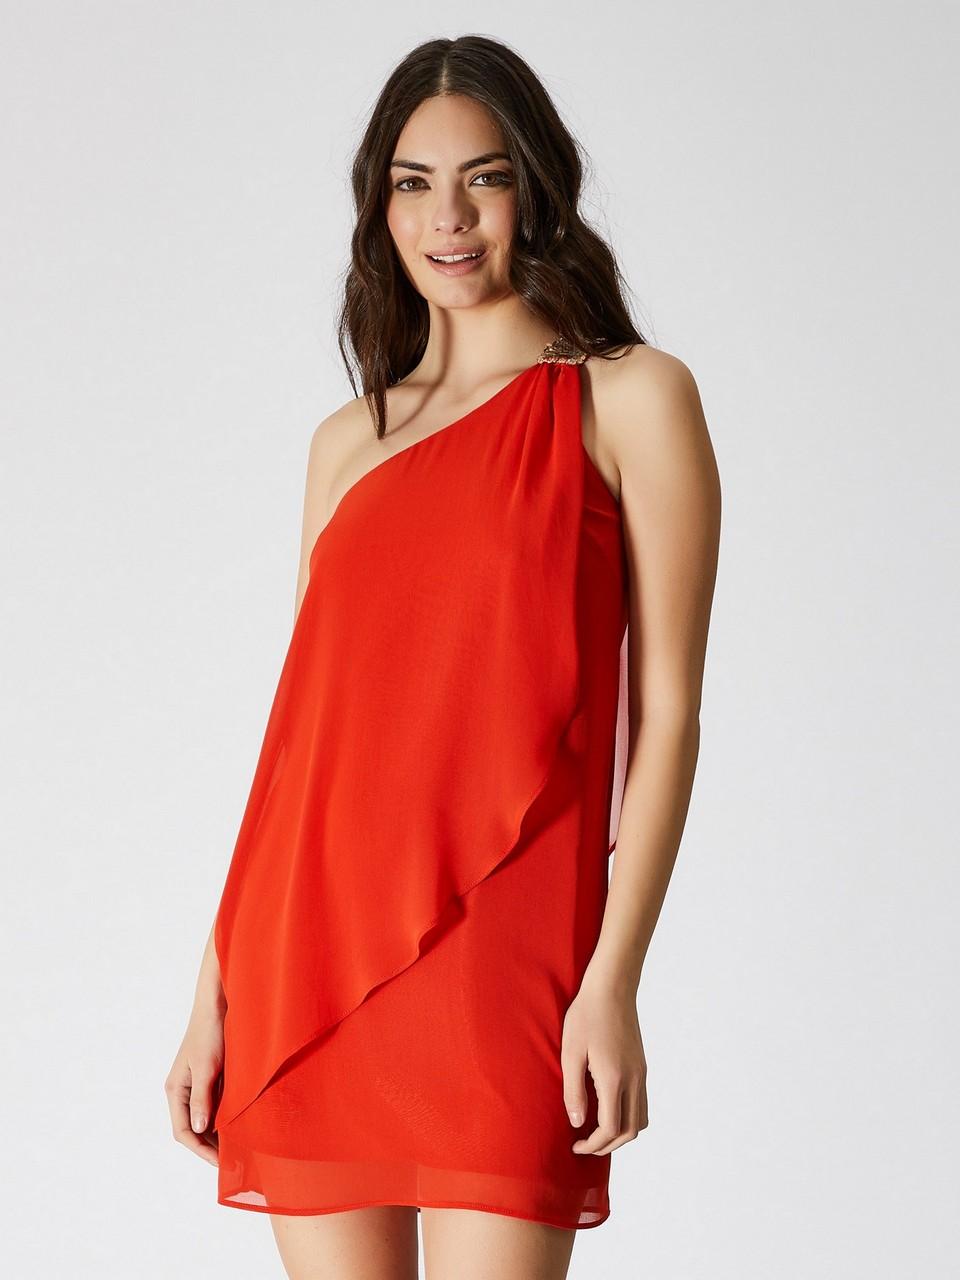 Tek Omuz Payet Detaylı Şifon Elbise